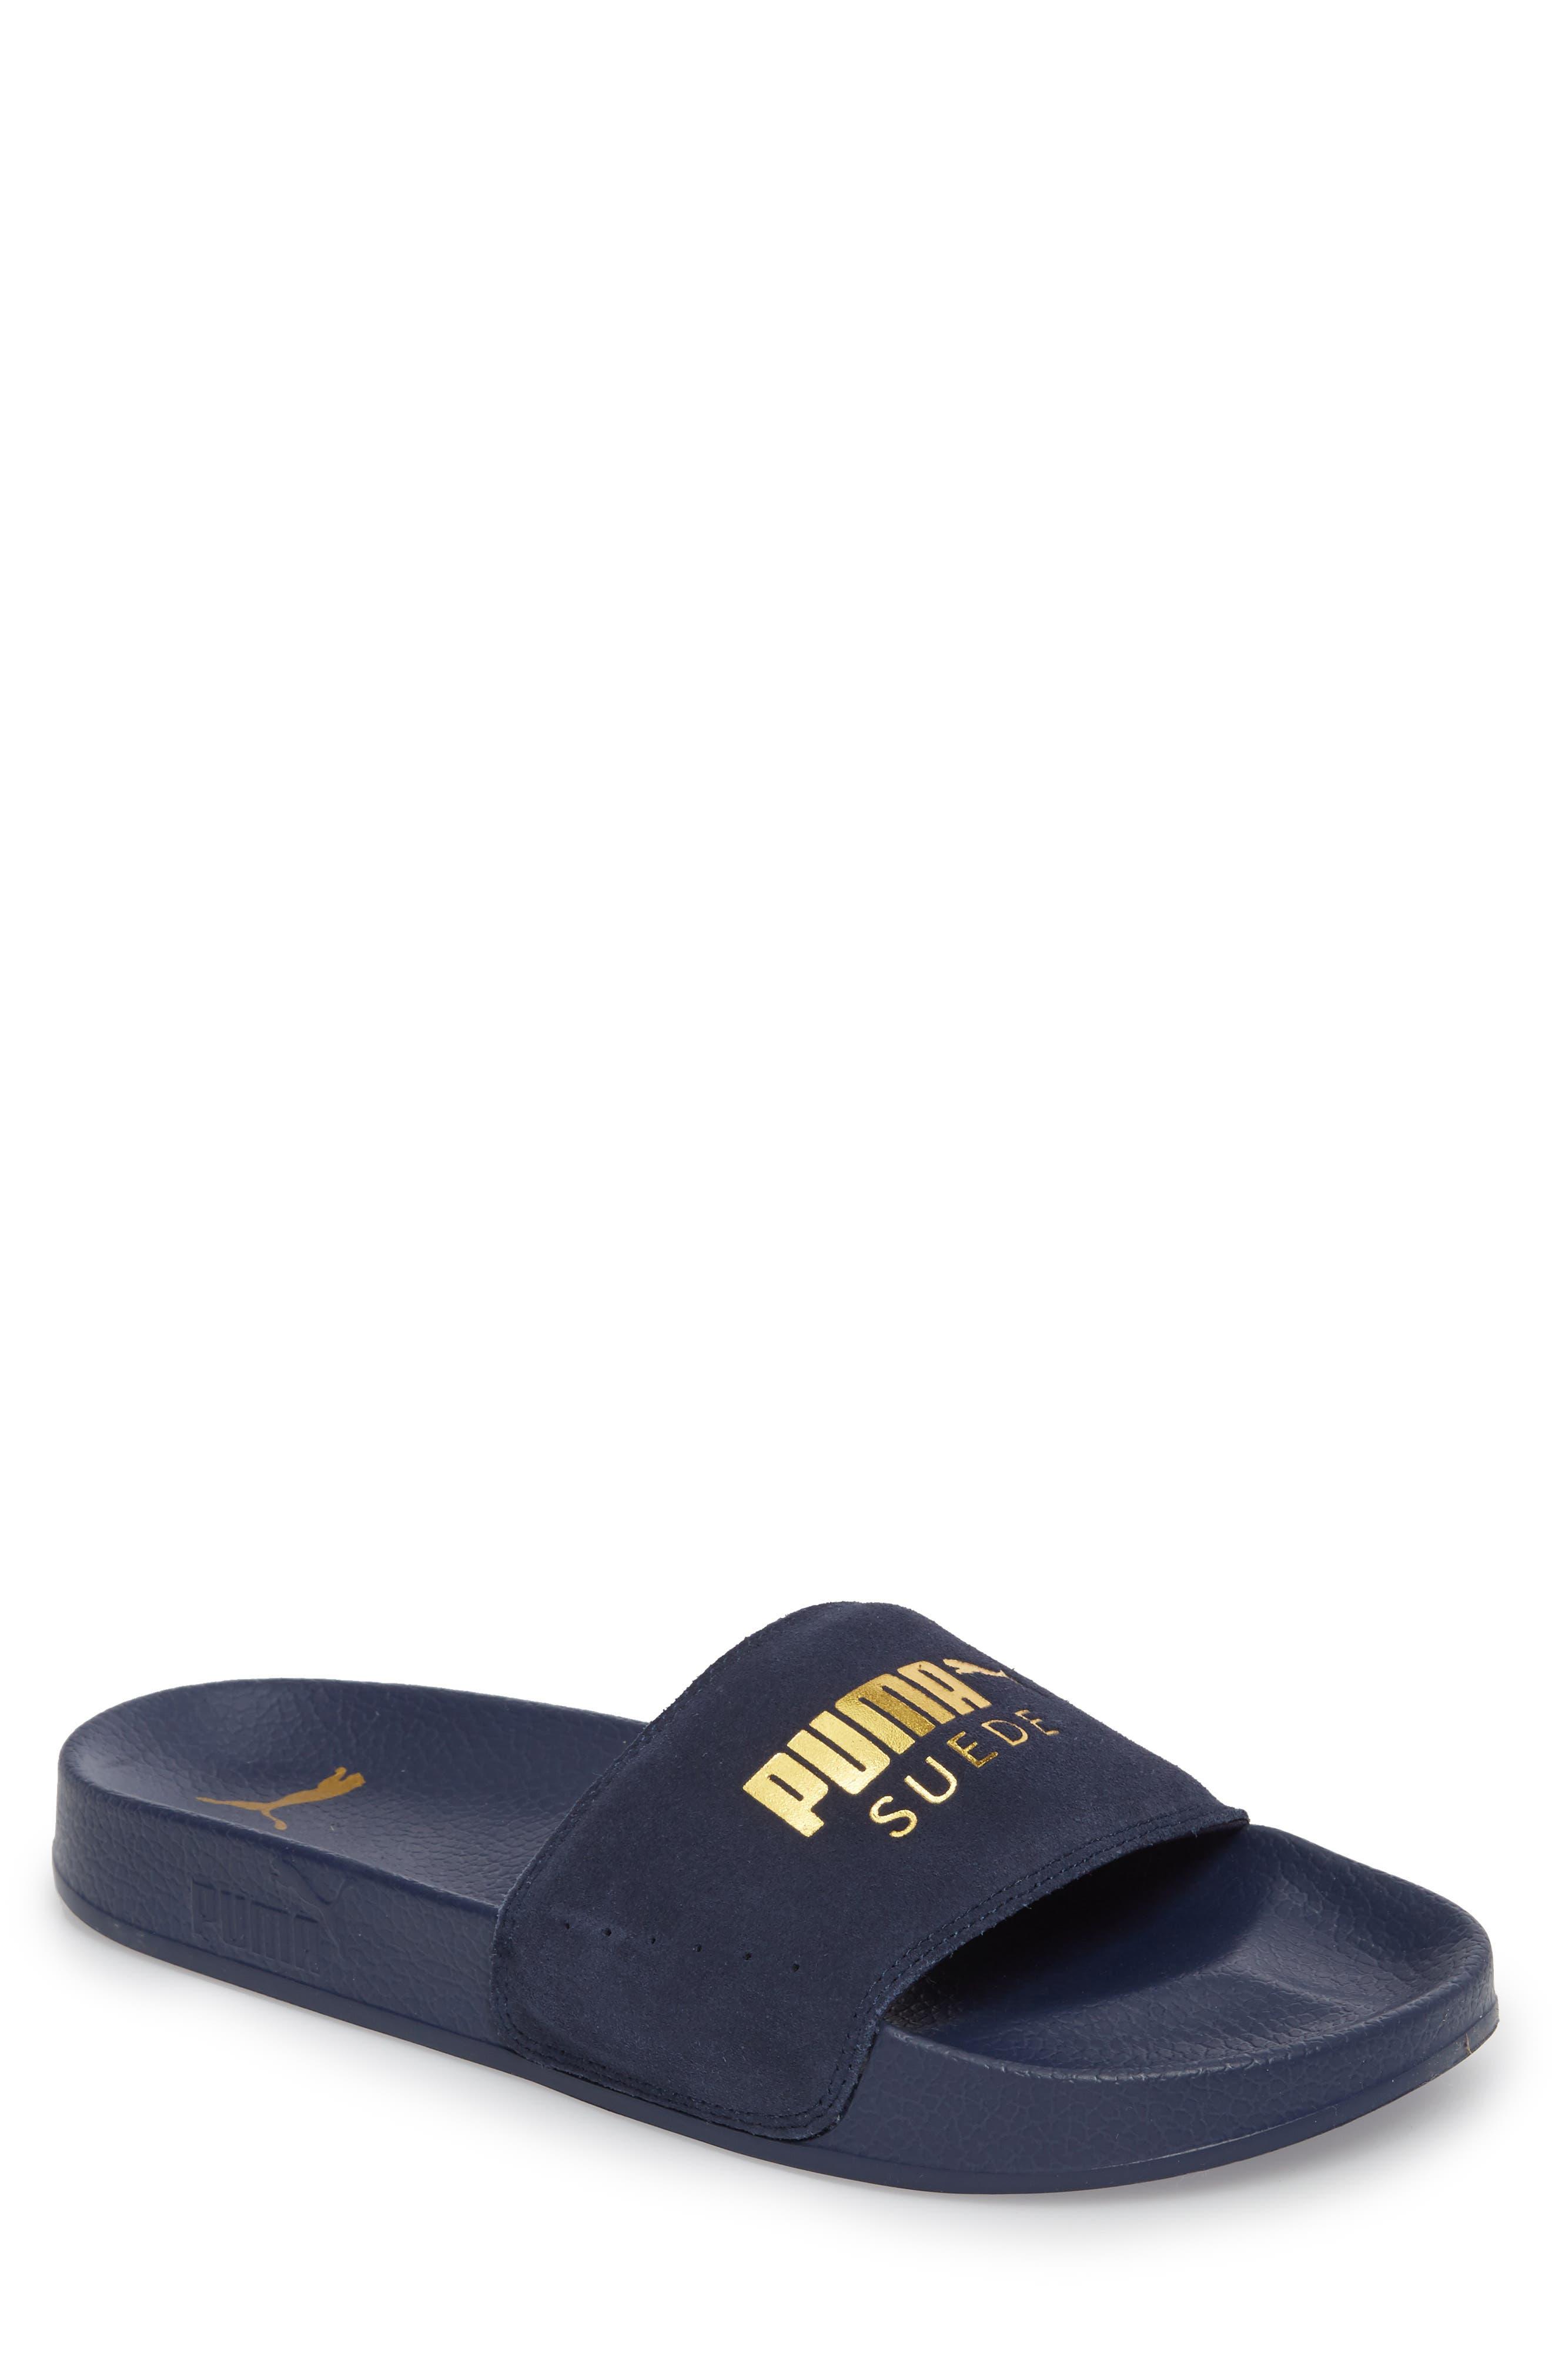 Leadcat Suede Slide Sandal,                             Main thumbnail 1, color,                             Peacoat/ Gold Leather/ Suede